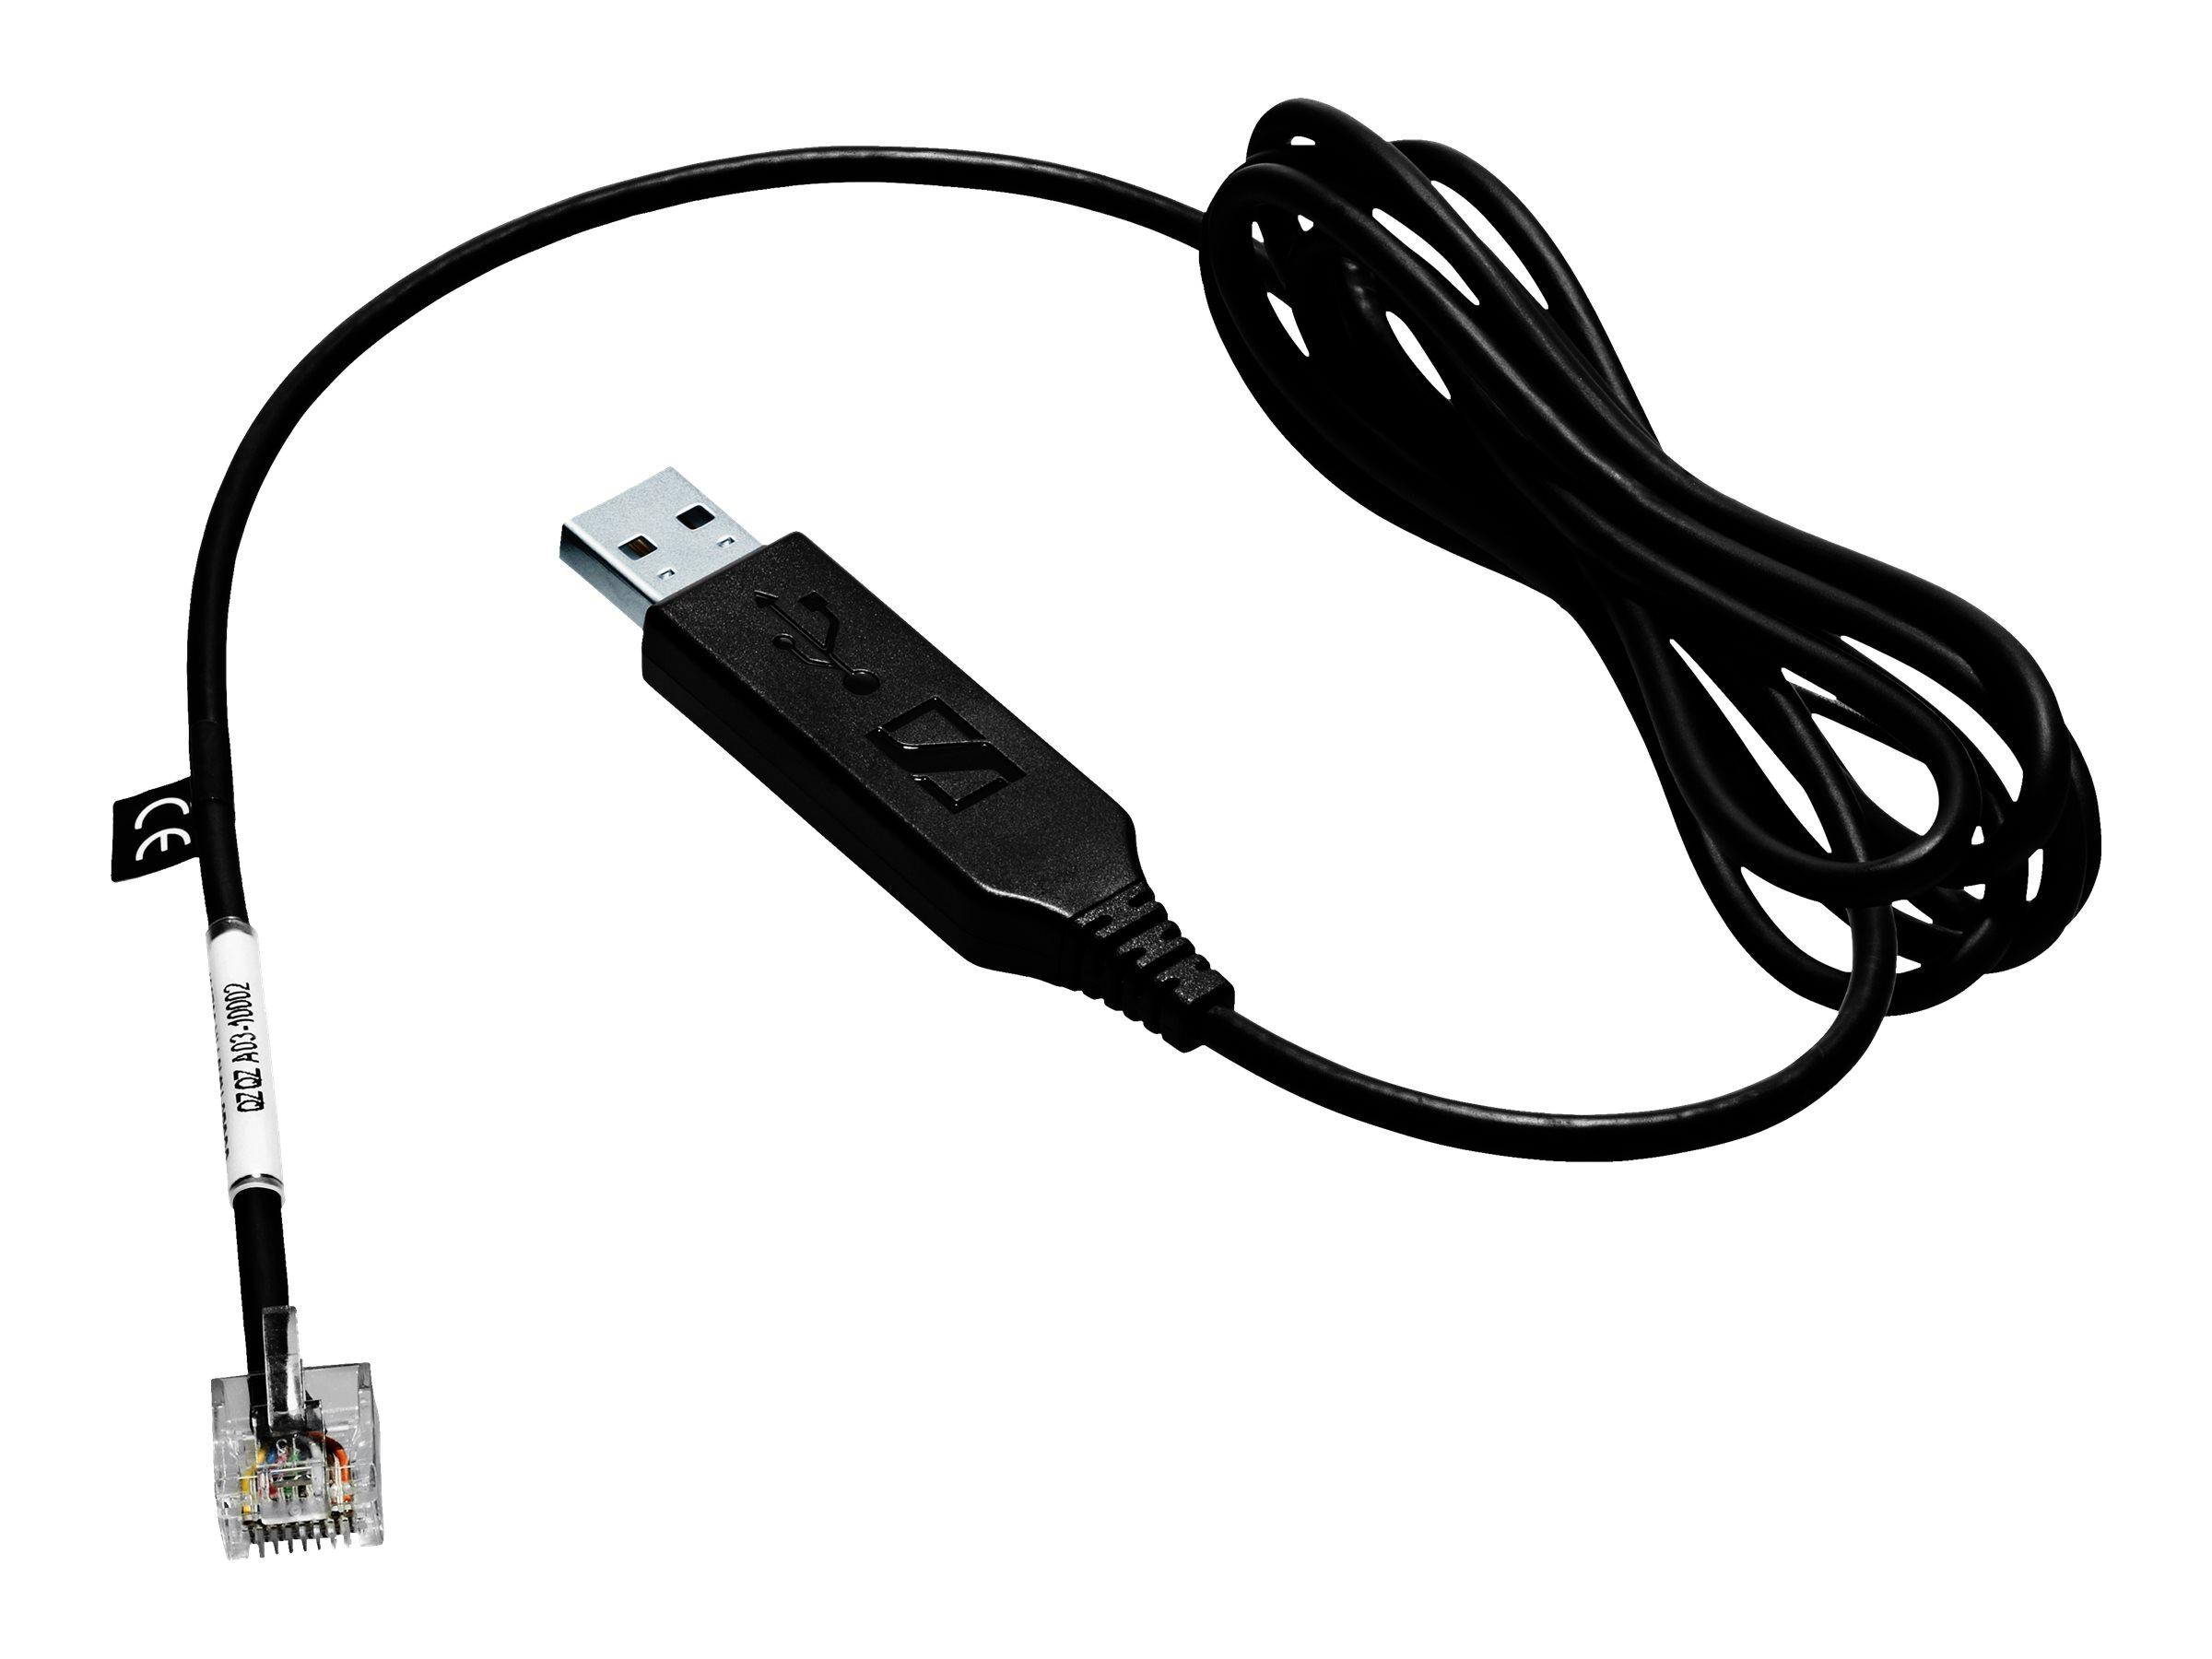 EPOS | SENNHEISER CEHS-CI 02 - Telefonadapter - RJ-45 (M) bis USB (M) - 1.5 m - für IMPACT SDW 5035, 5065